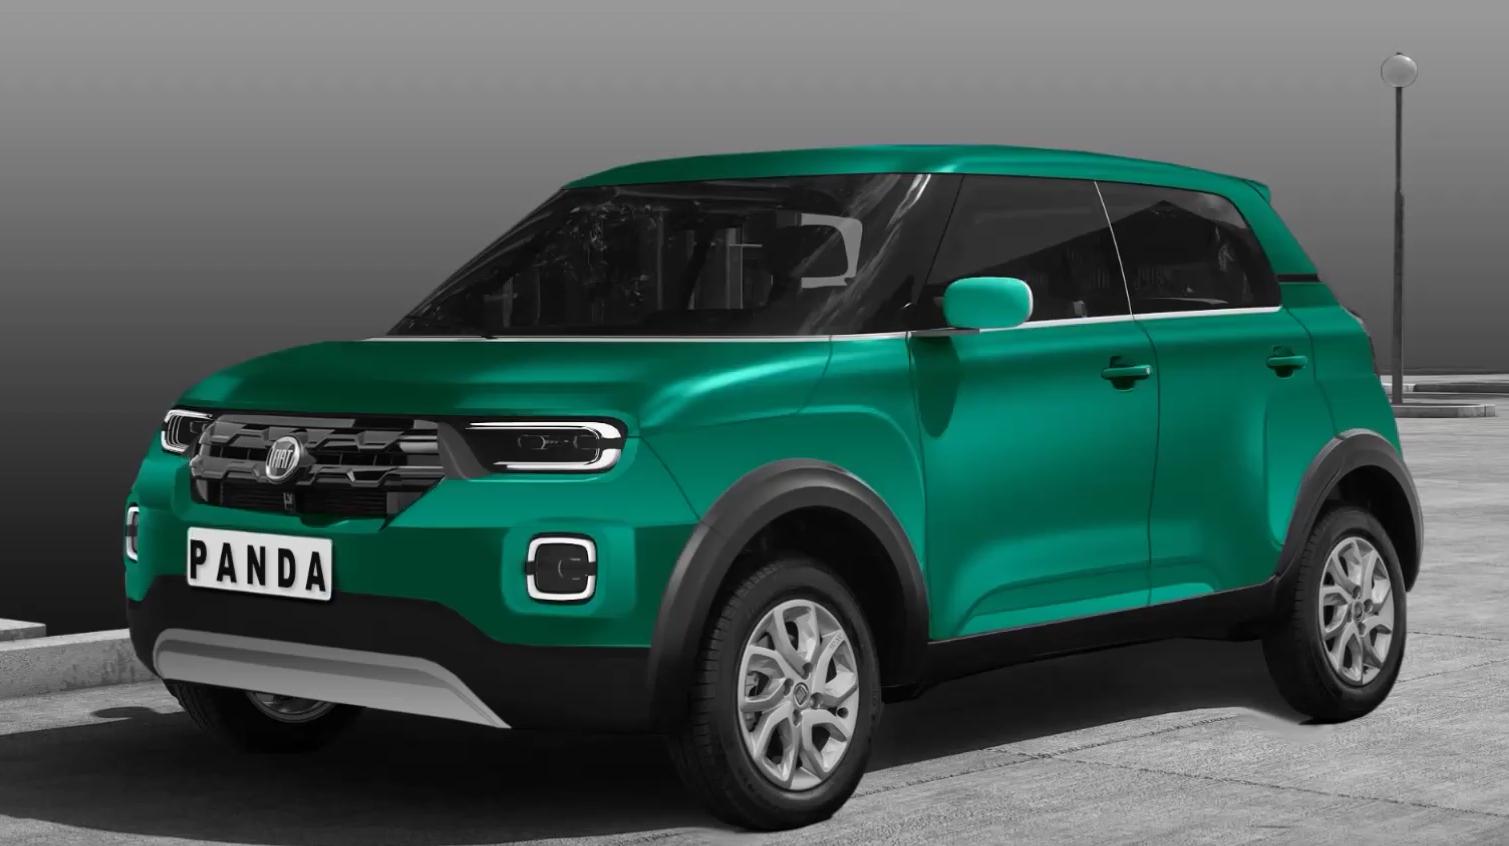 Nuova Fiat Panda render